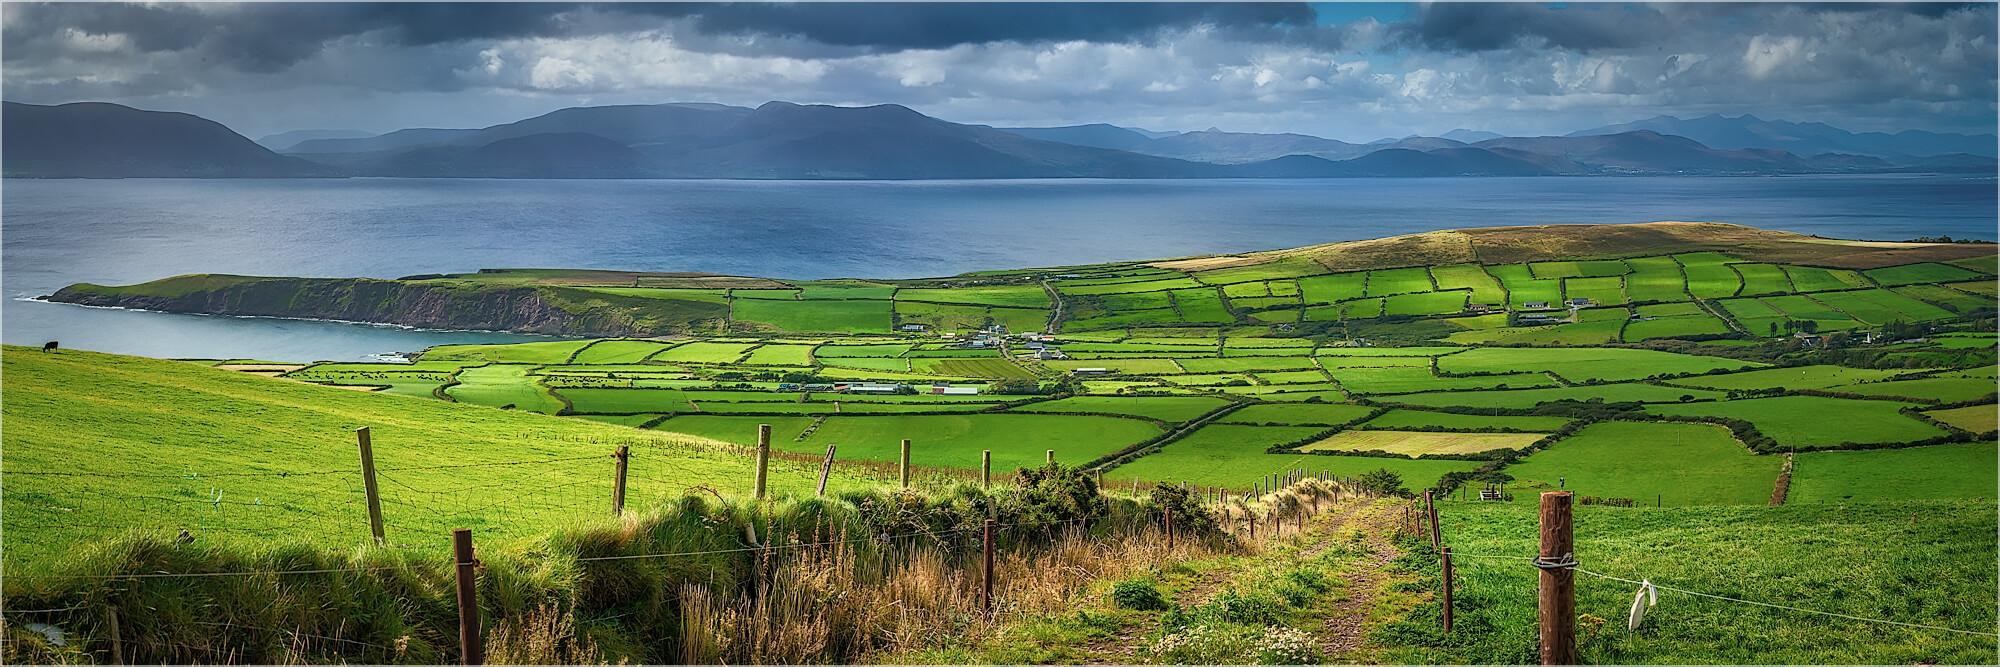 Panoramabild Landschaft von Dingle Kerry Irland